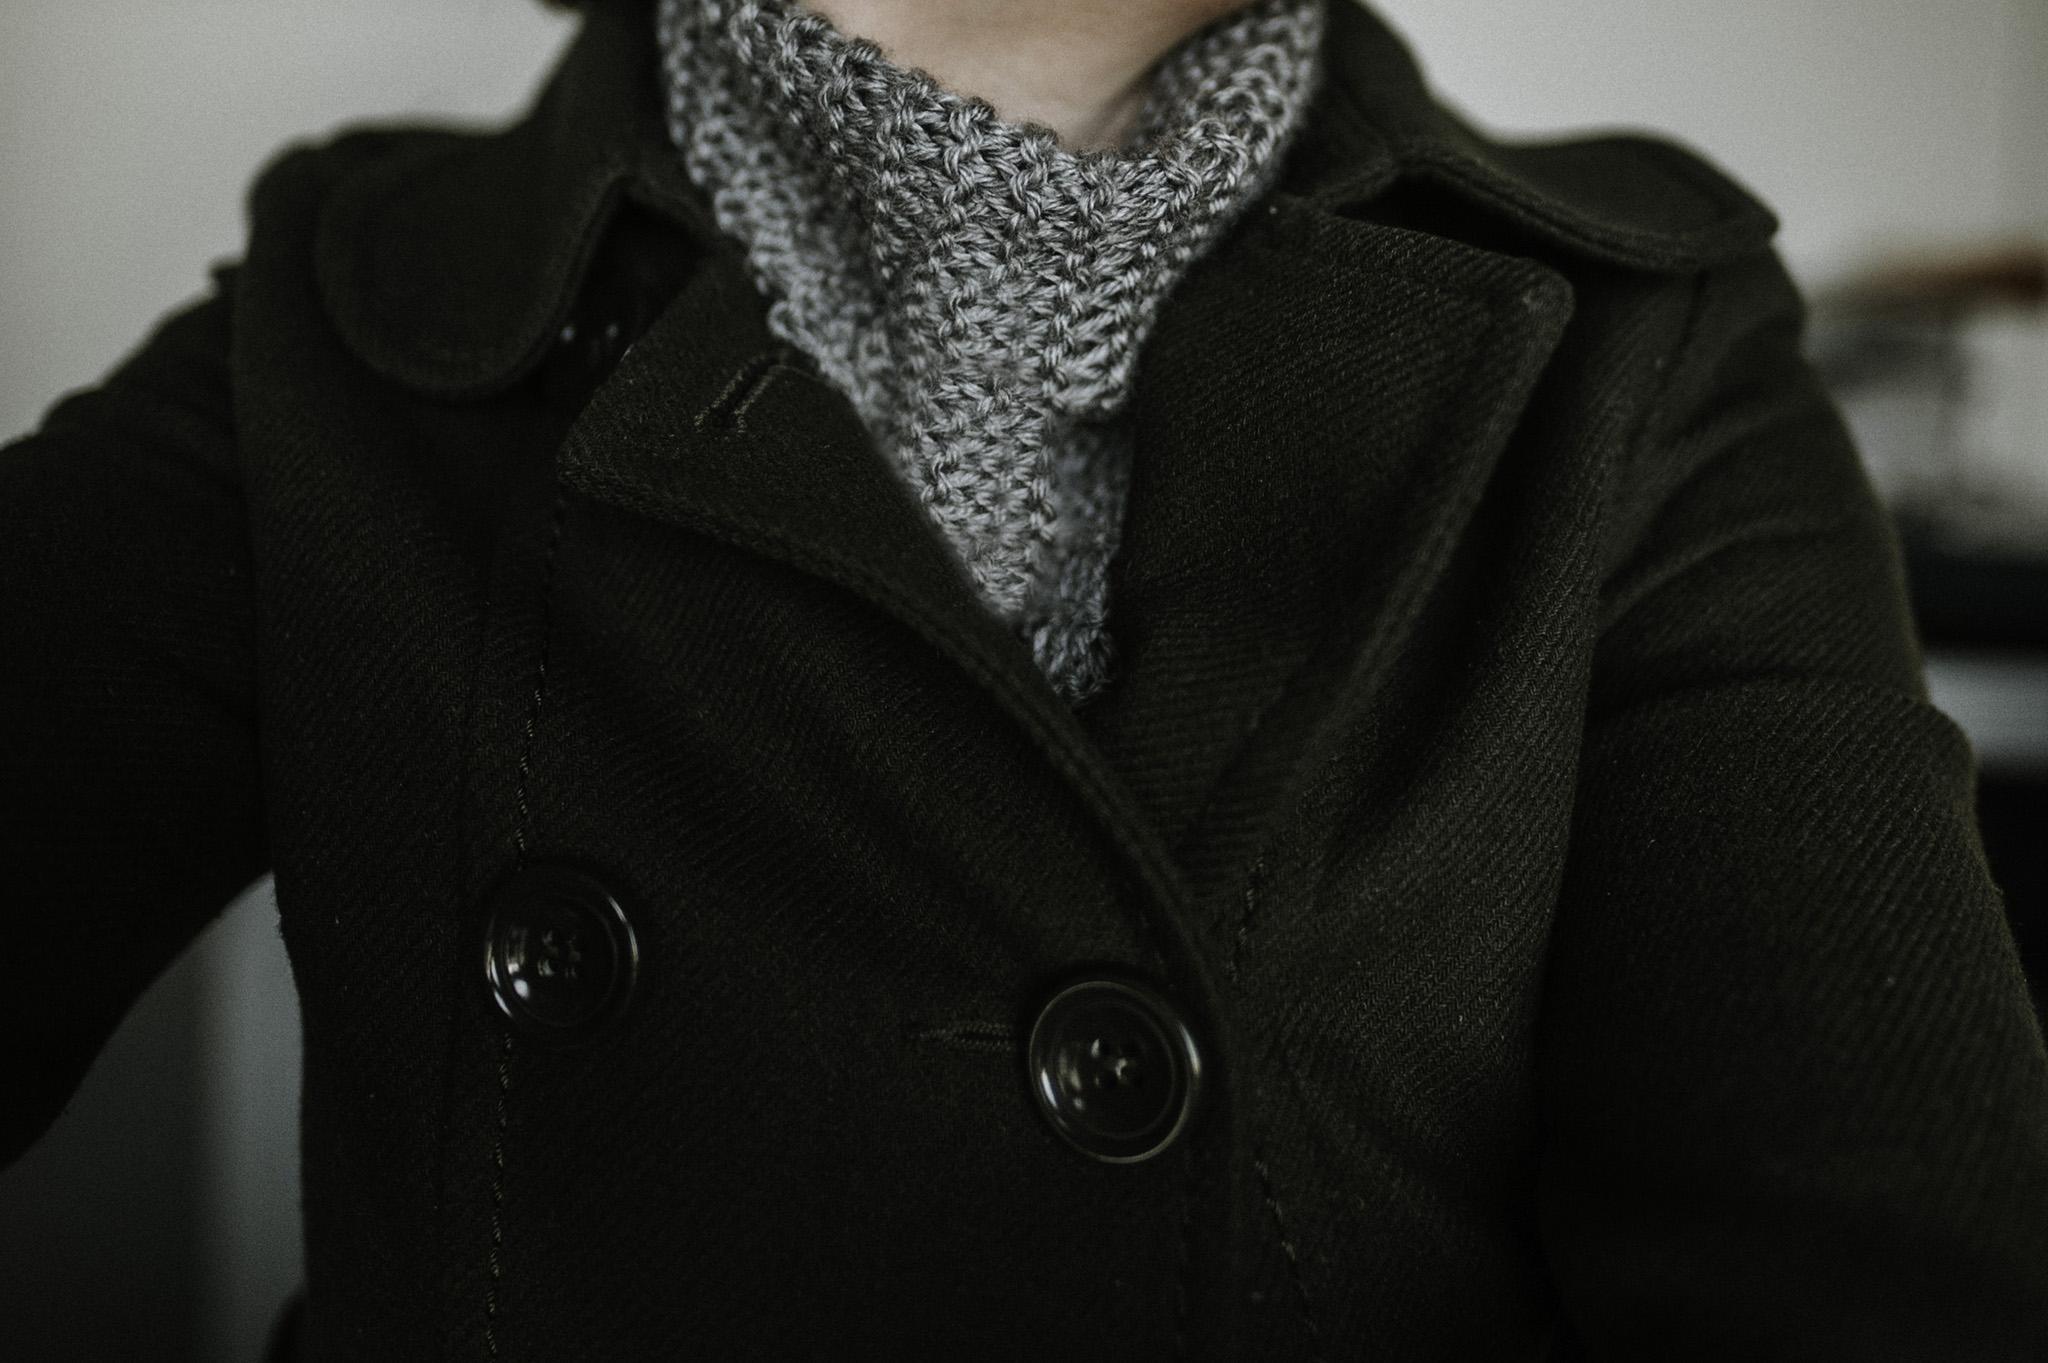 January 25: Texture.